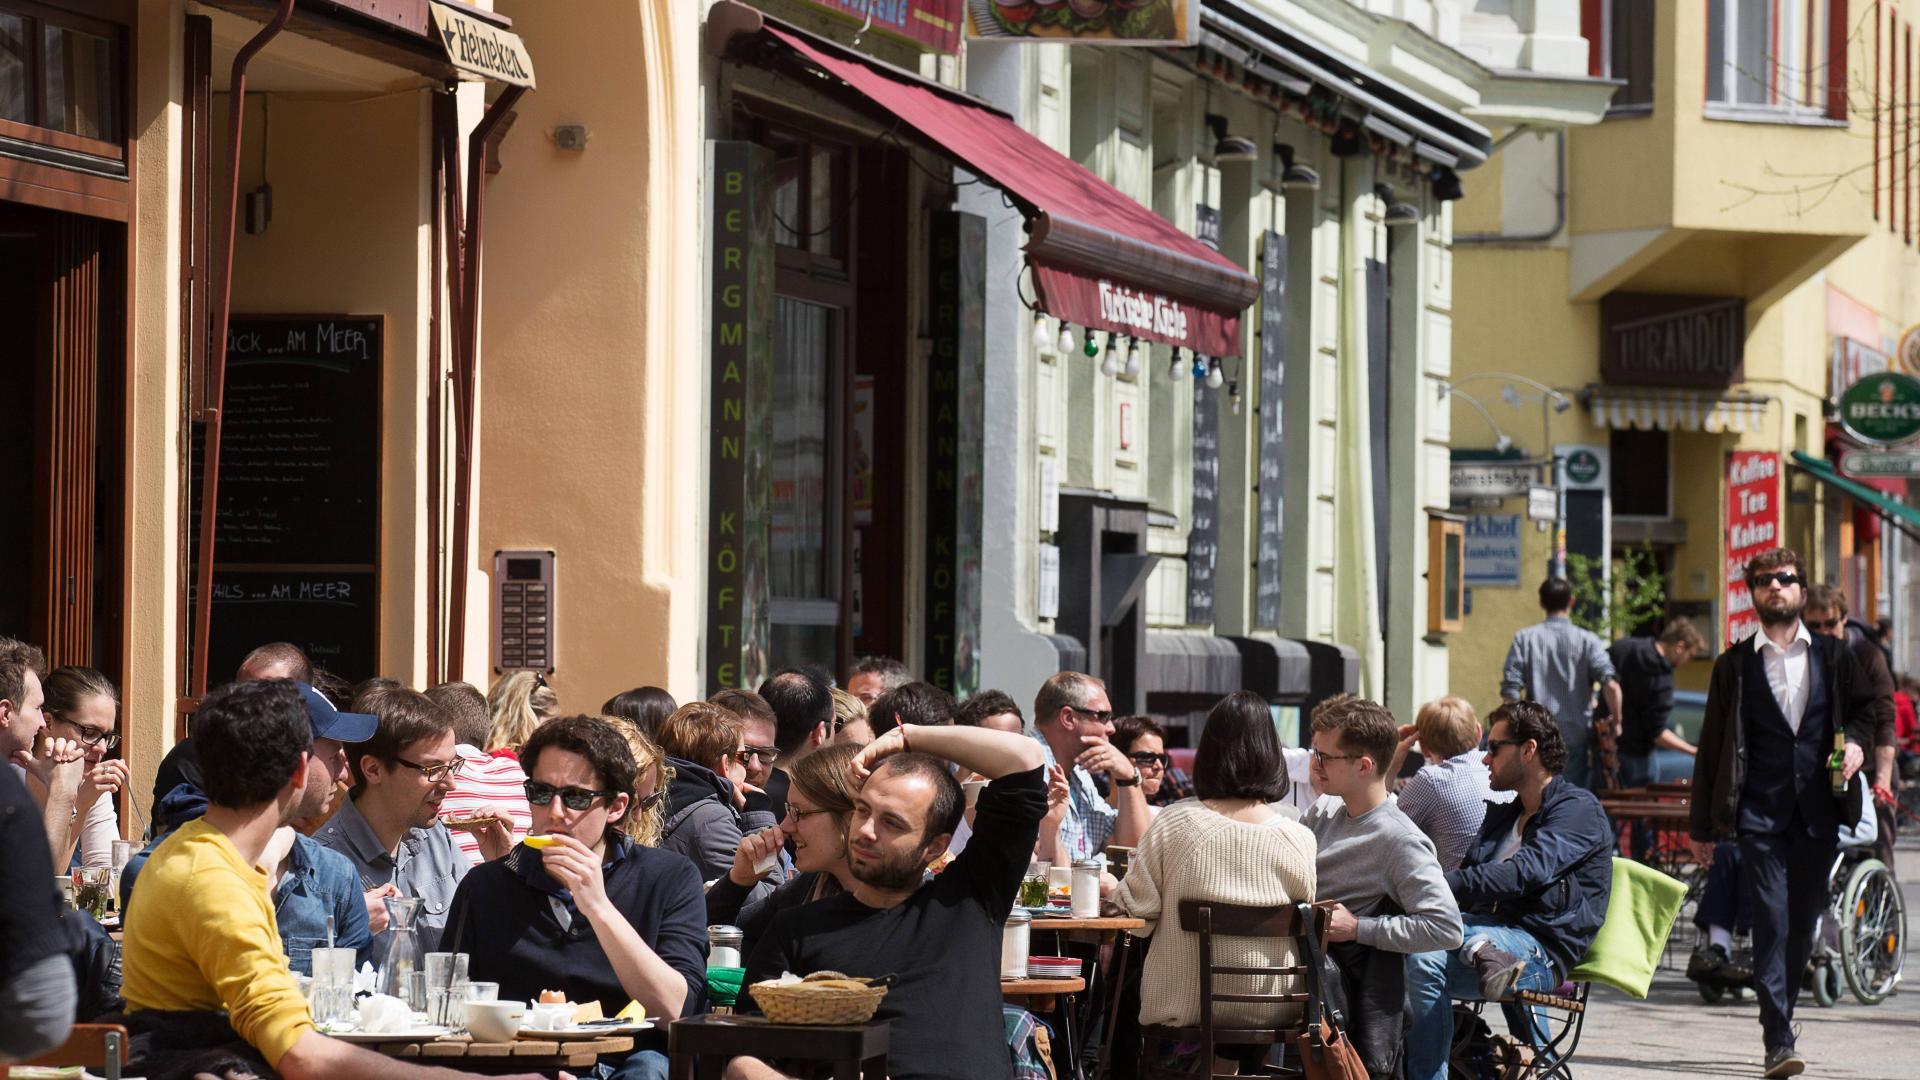 Die Berliner Bergmannstrasse in Kreuzberg. cafe menchen